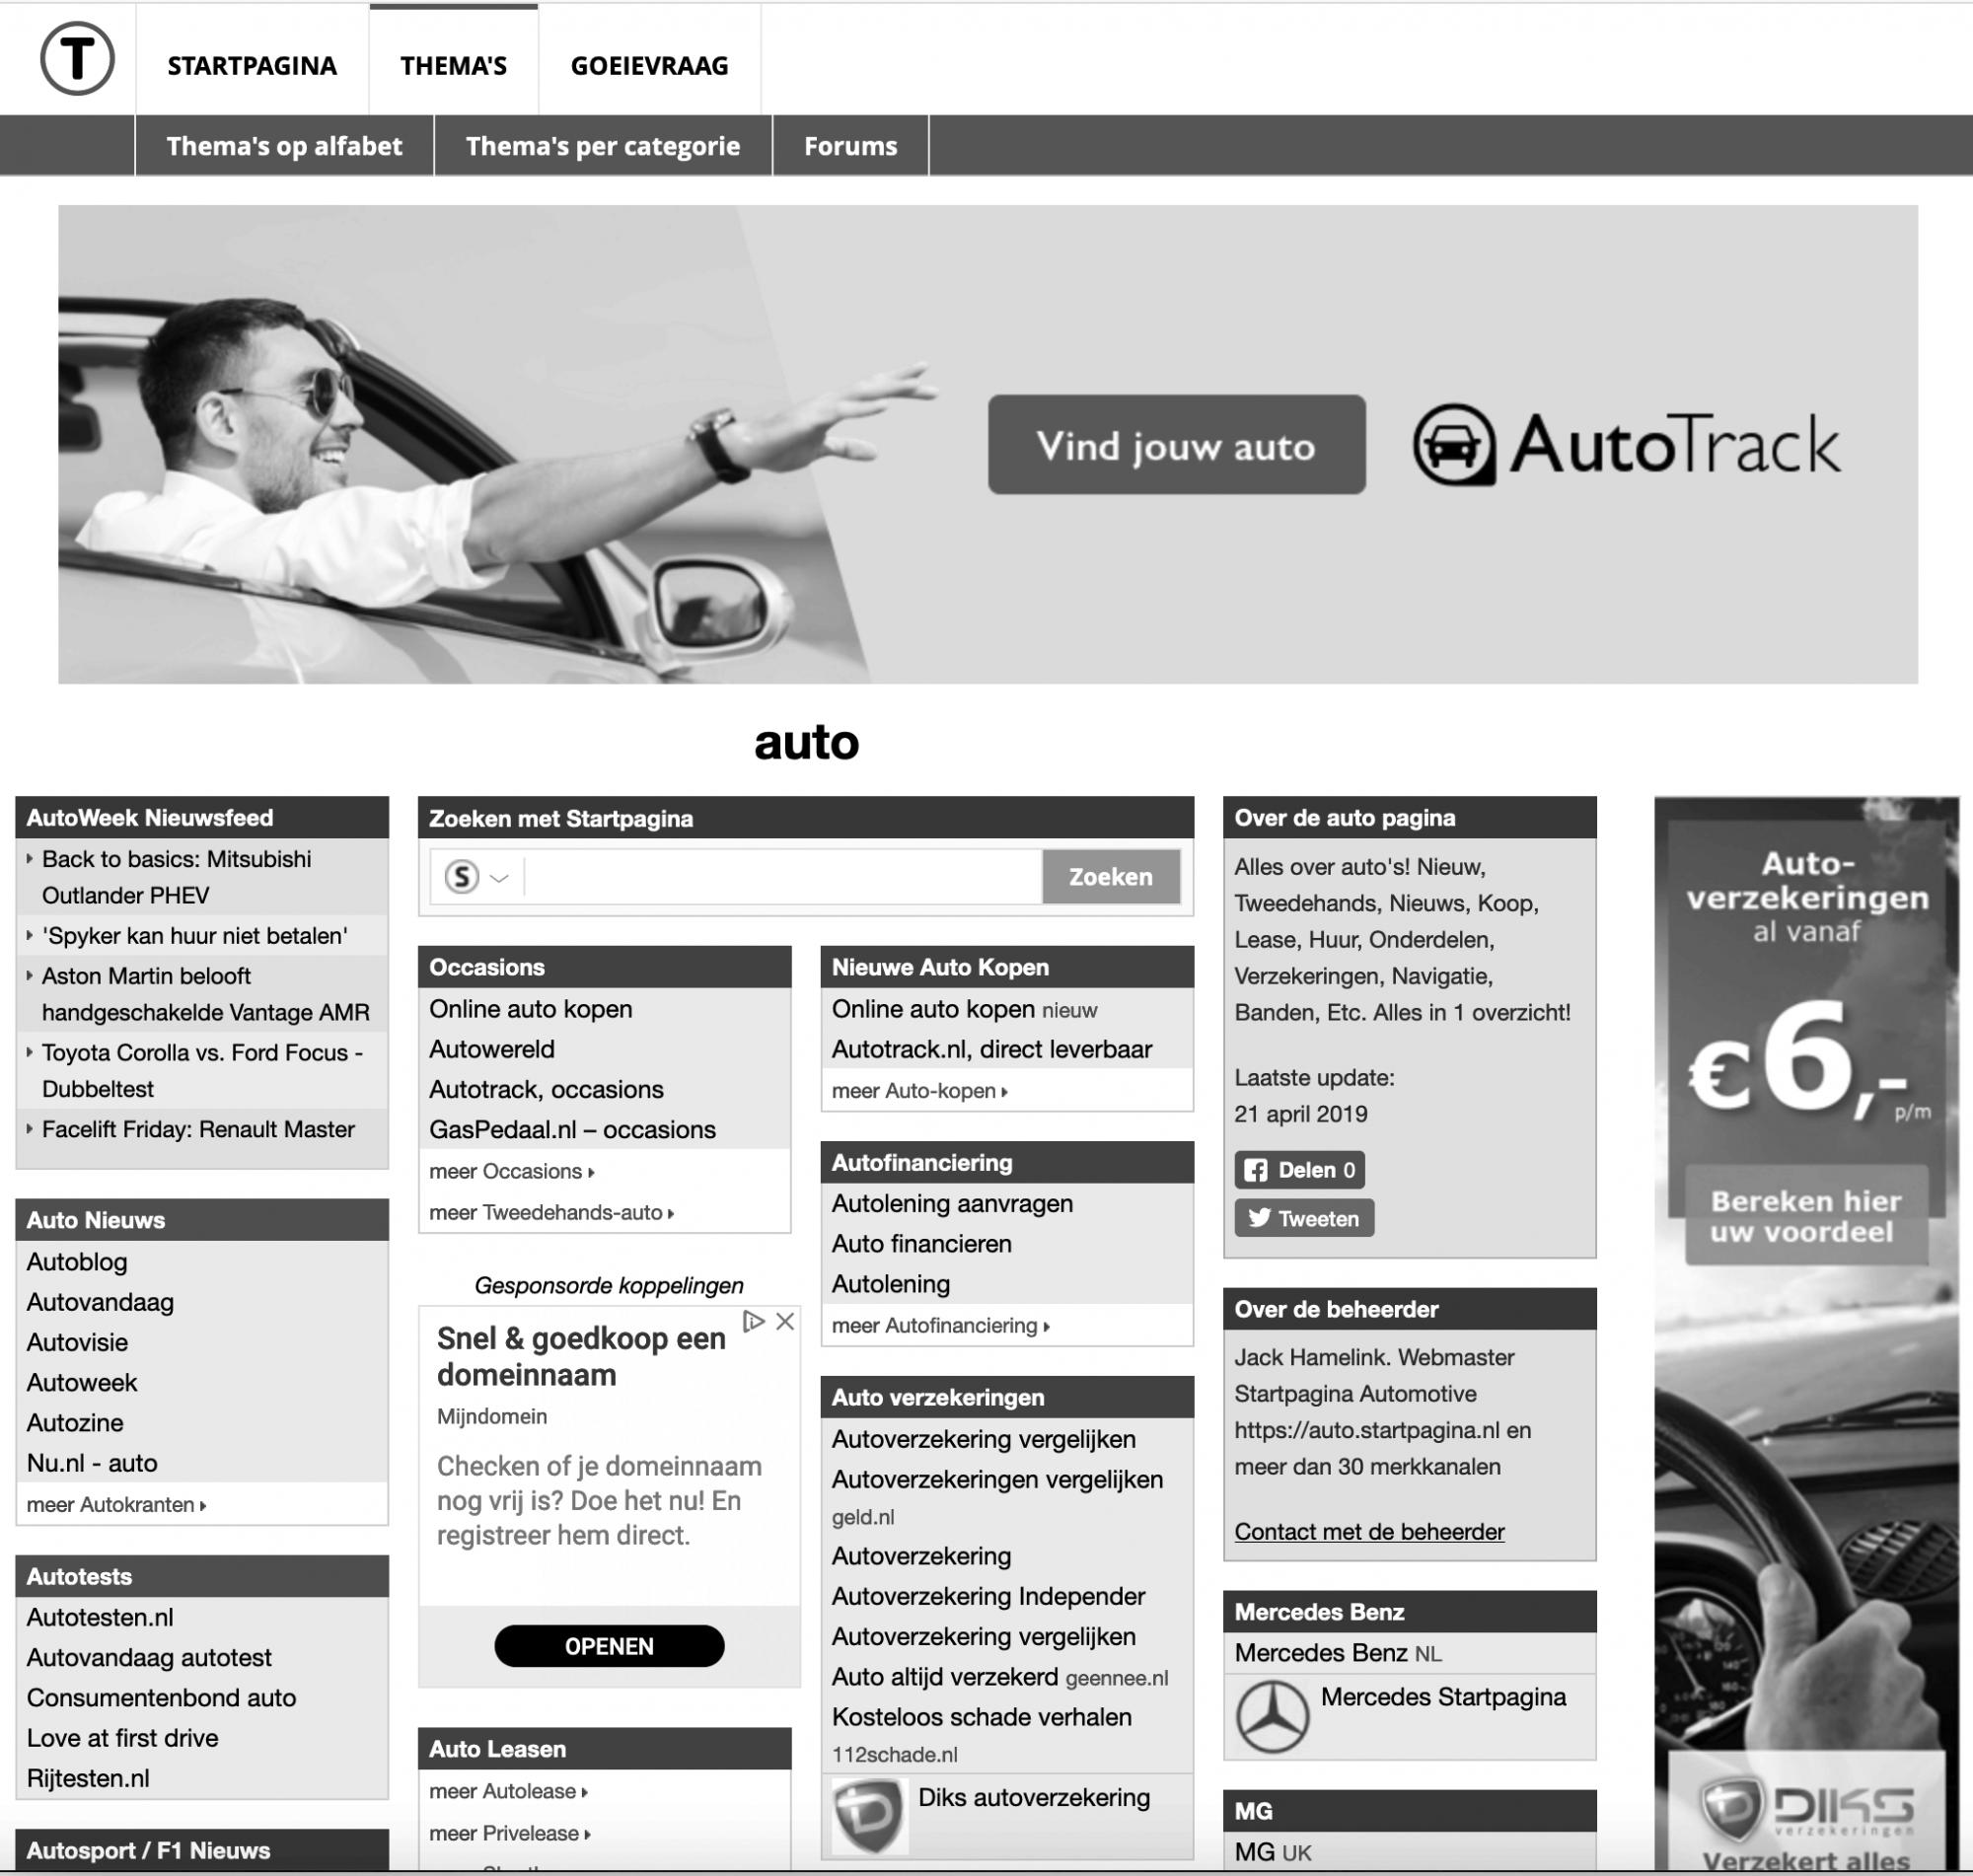 HameLinkweb Internetdiensten